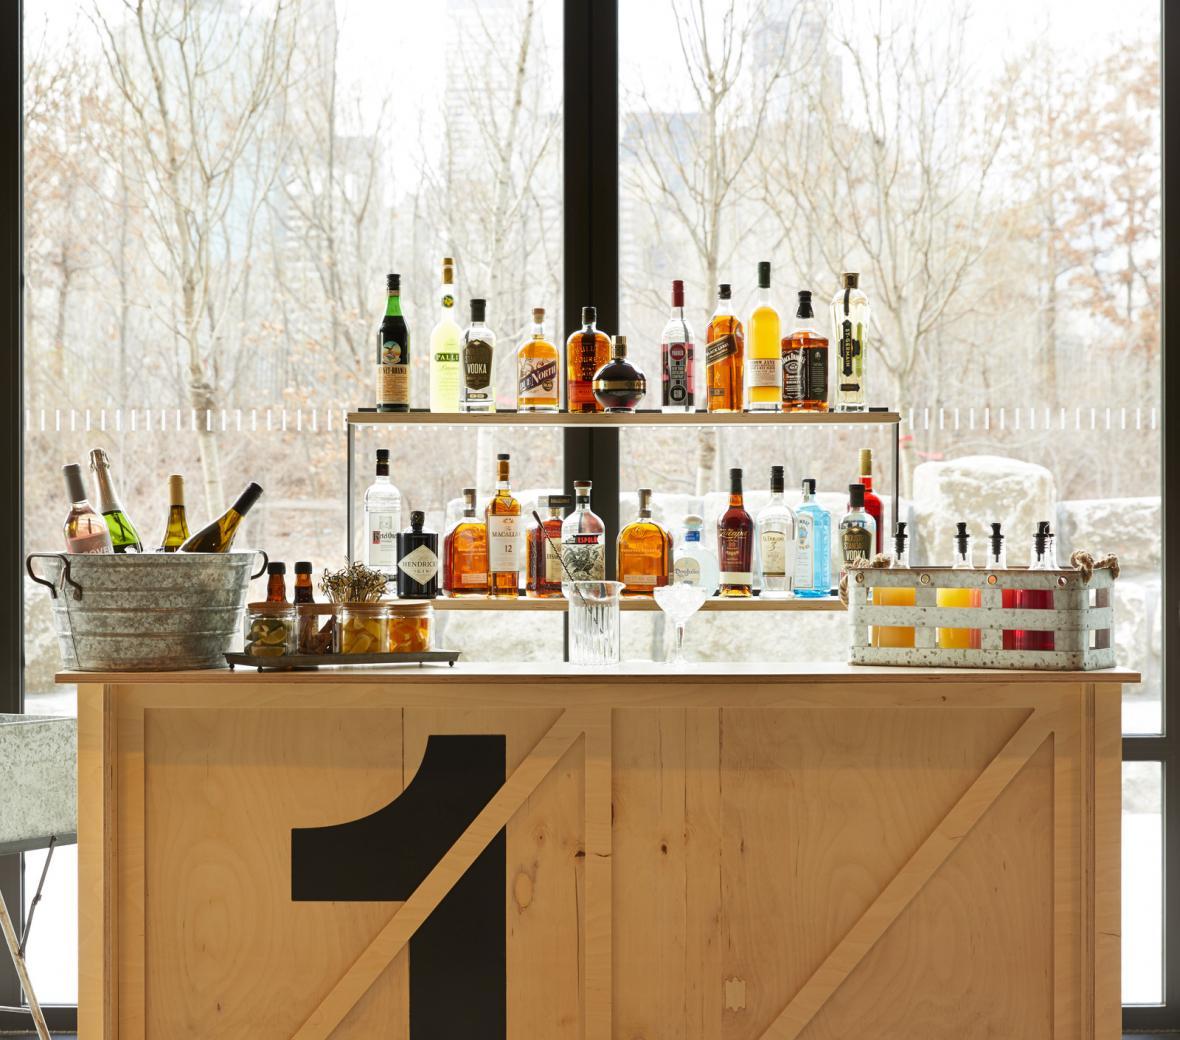 A wooden lobby bar with an array of liquor bottles at 1 Hotel Brooklyn Bridge.